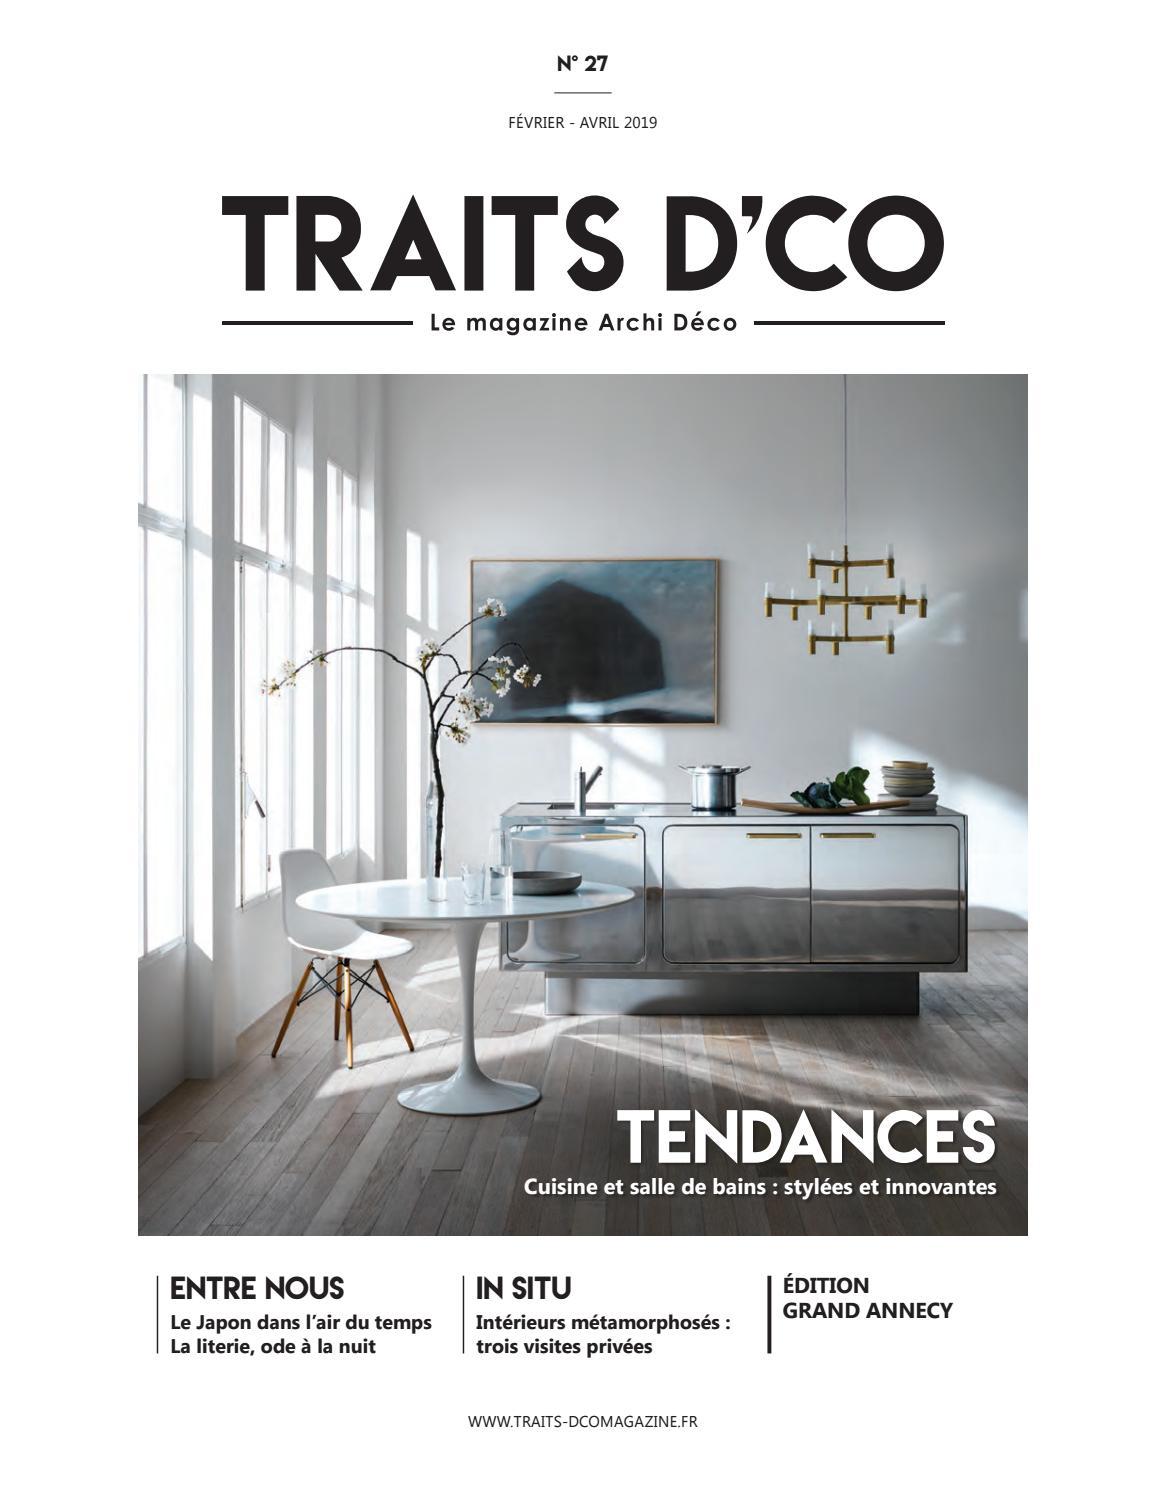 Ecole De Design Annecy traits dco magazine grand annecy n27traits d'co - issuu